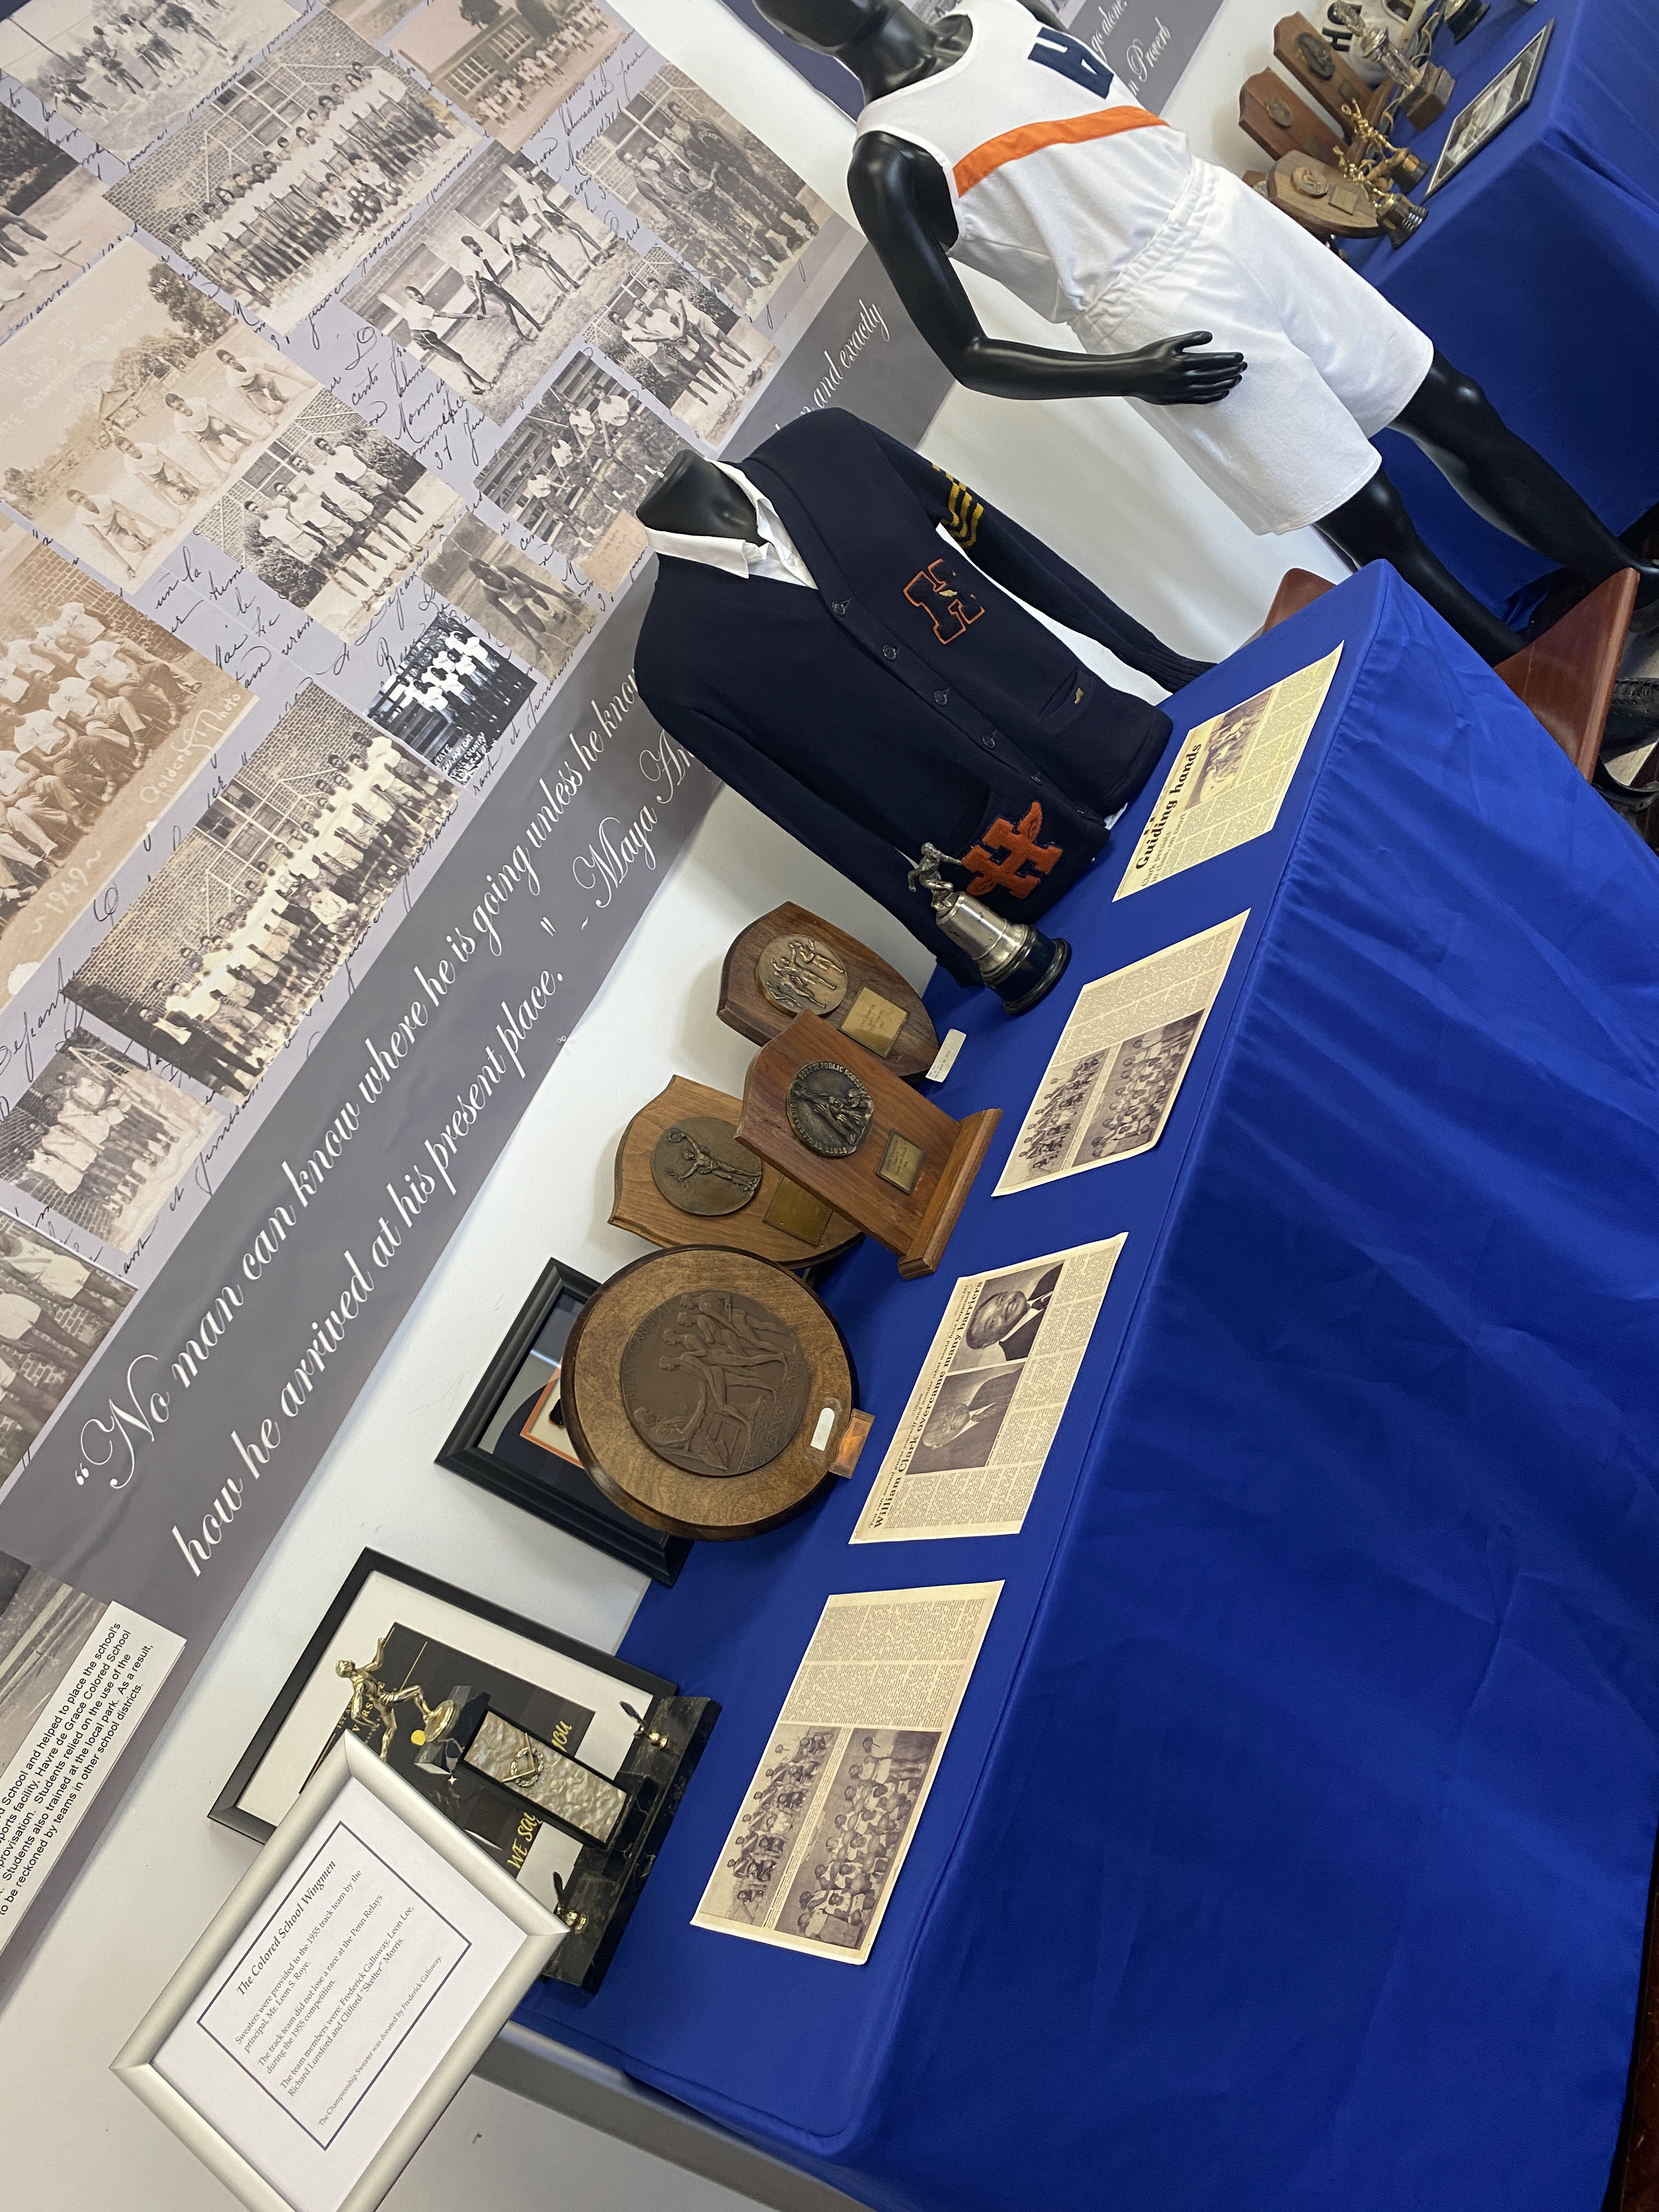 Numerous award won by the Havre de Grace Colored School athletic programs